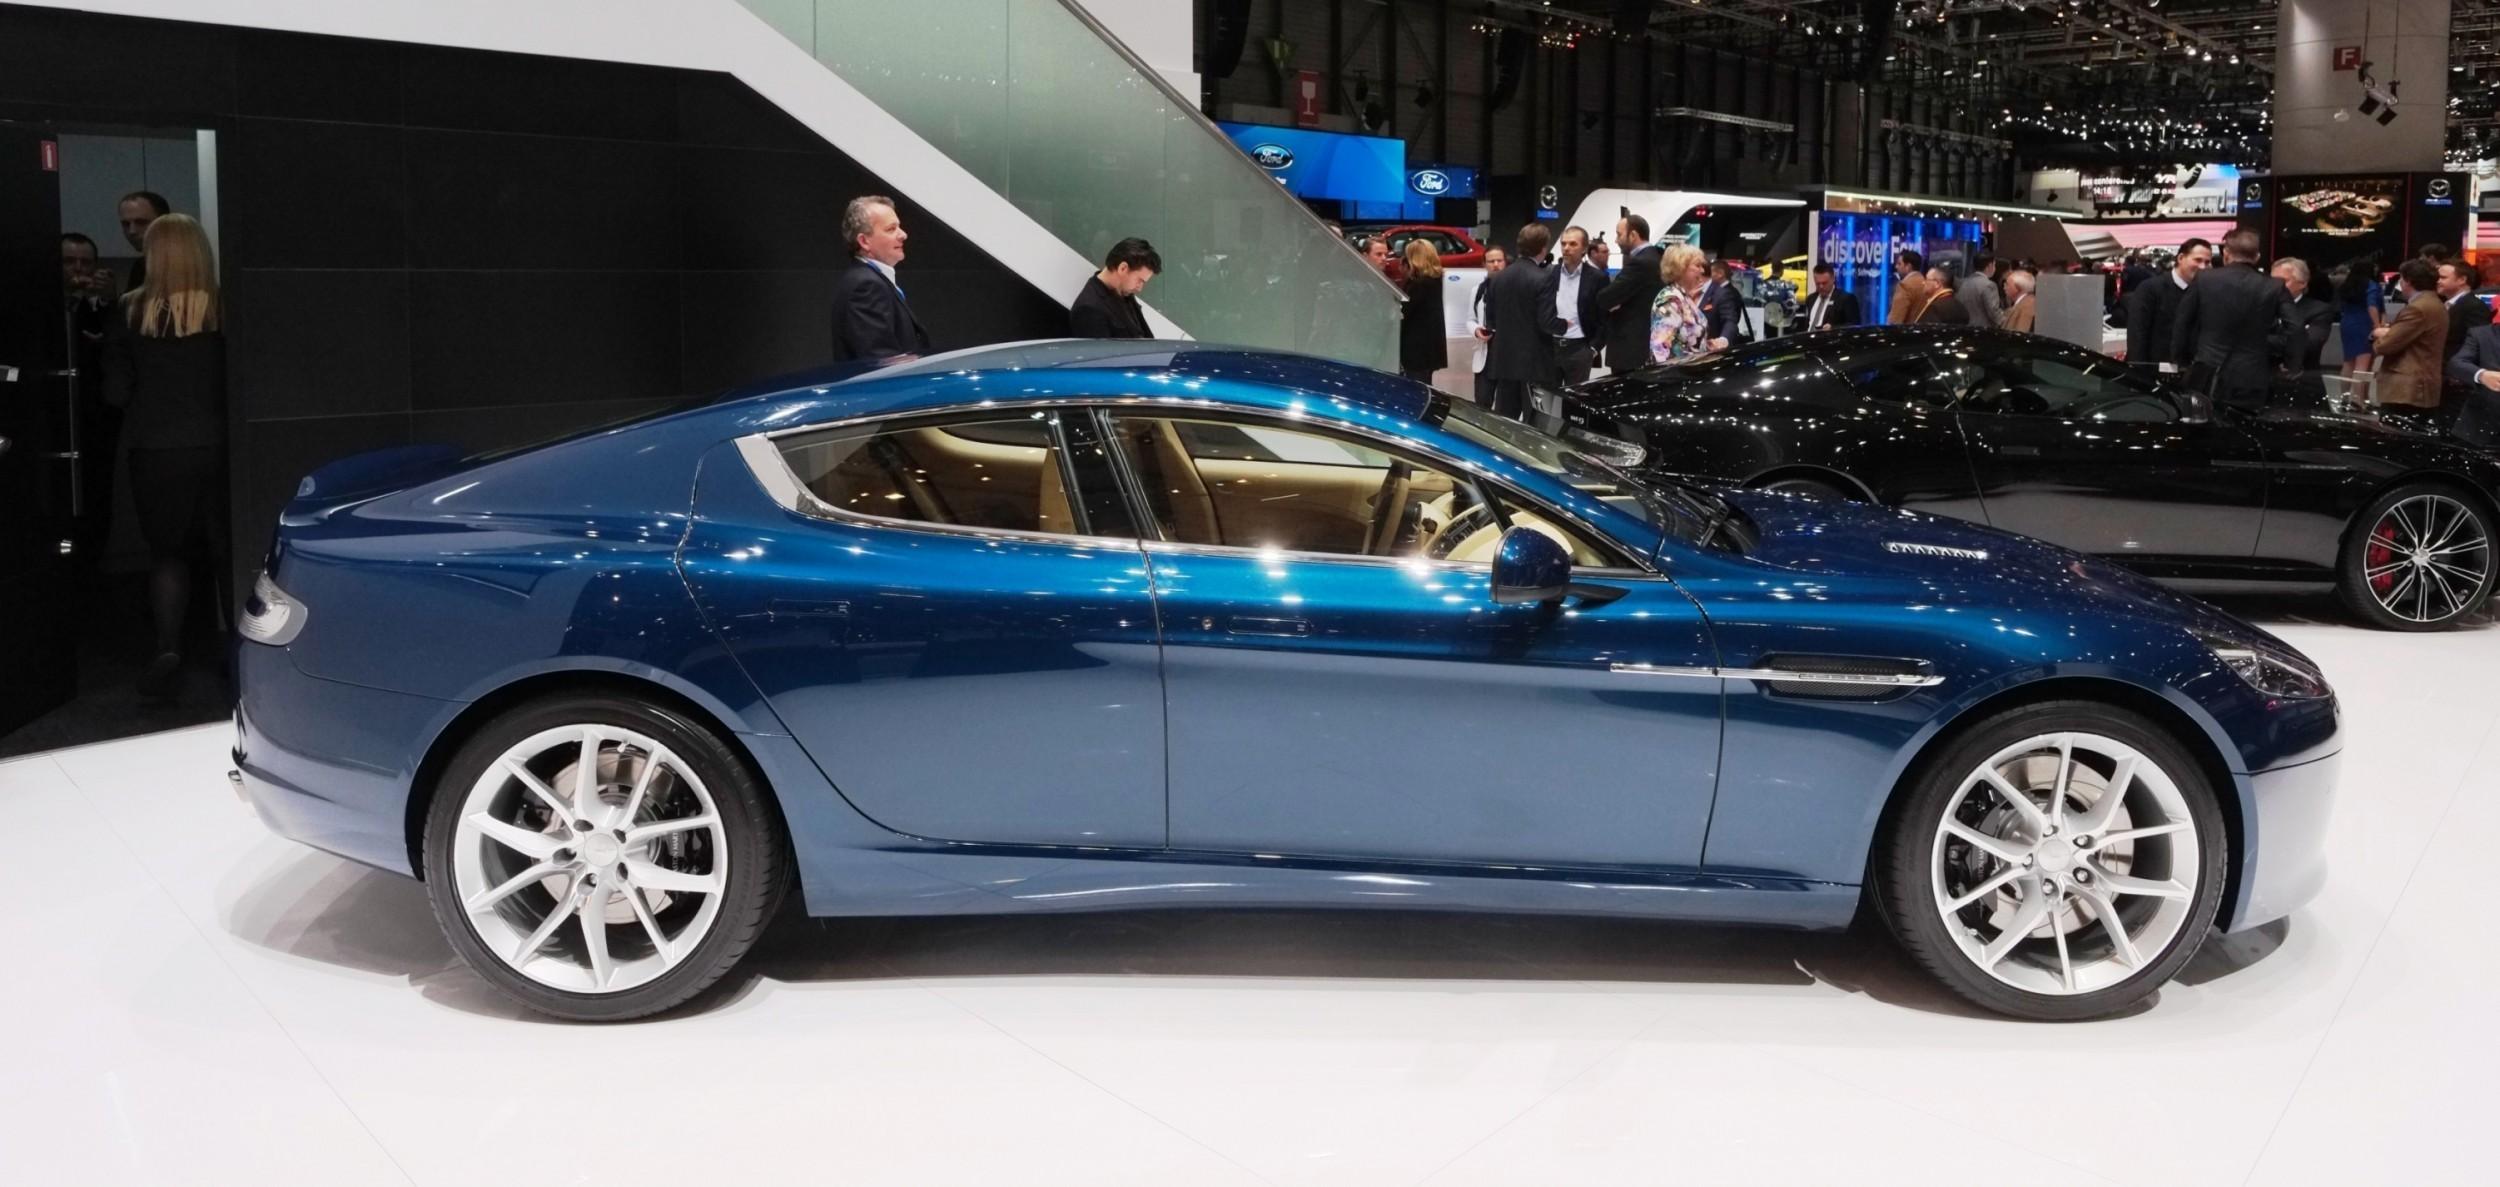 exclusive! future car rendering - 2016 aston martin lv8 - lagonda